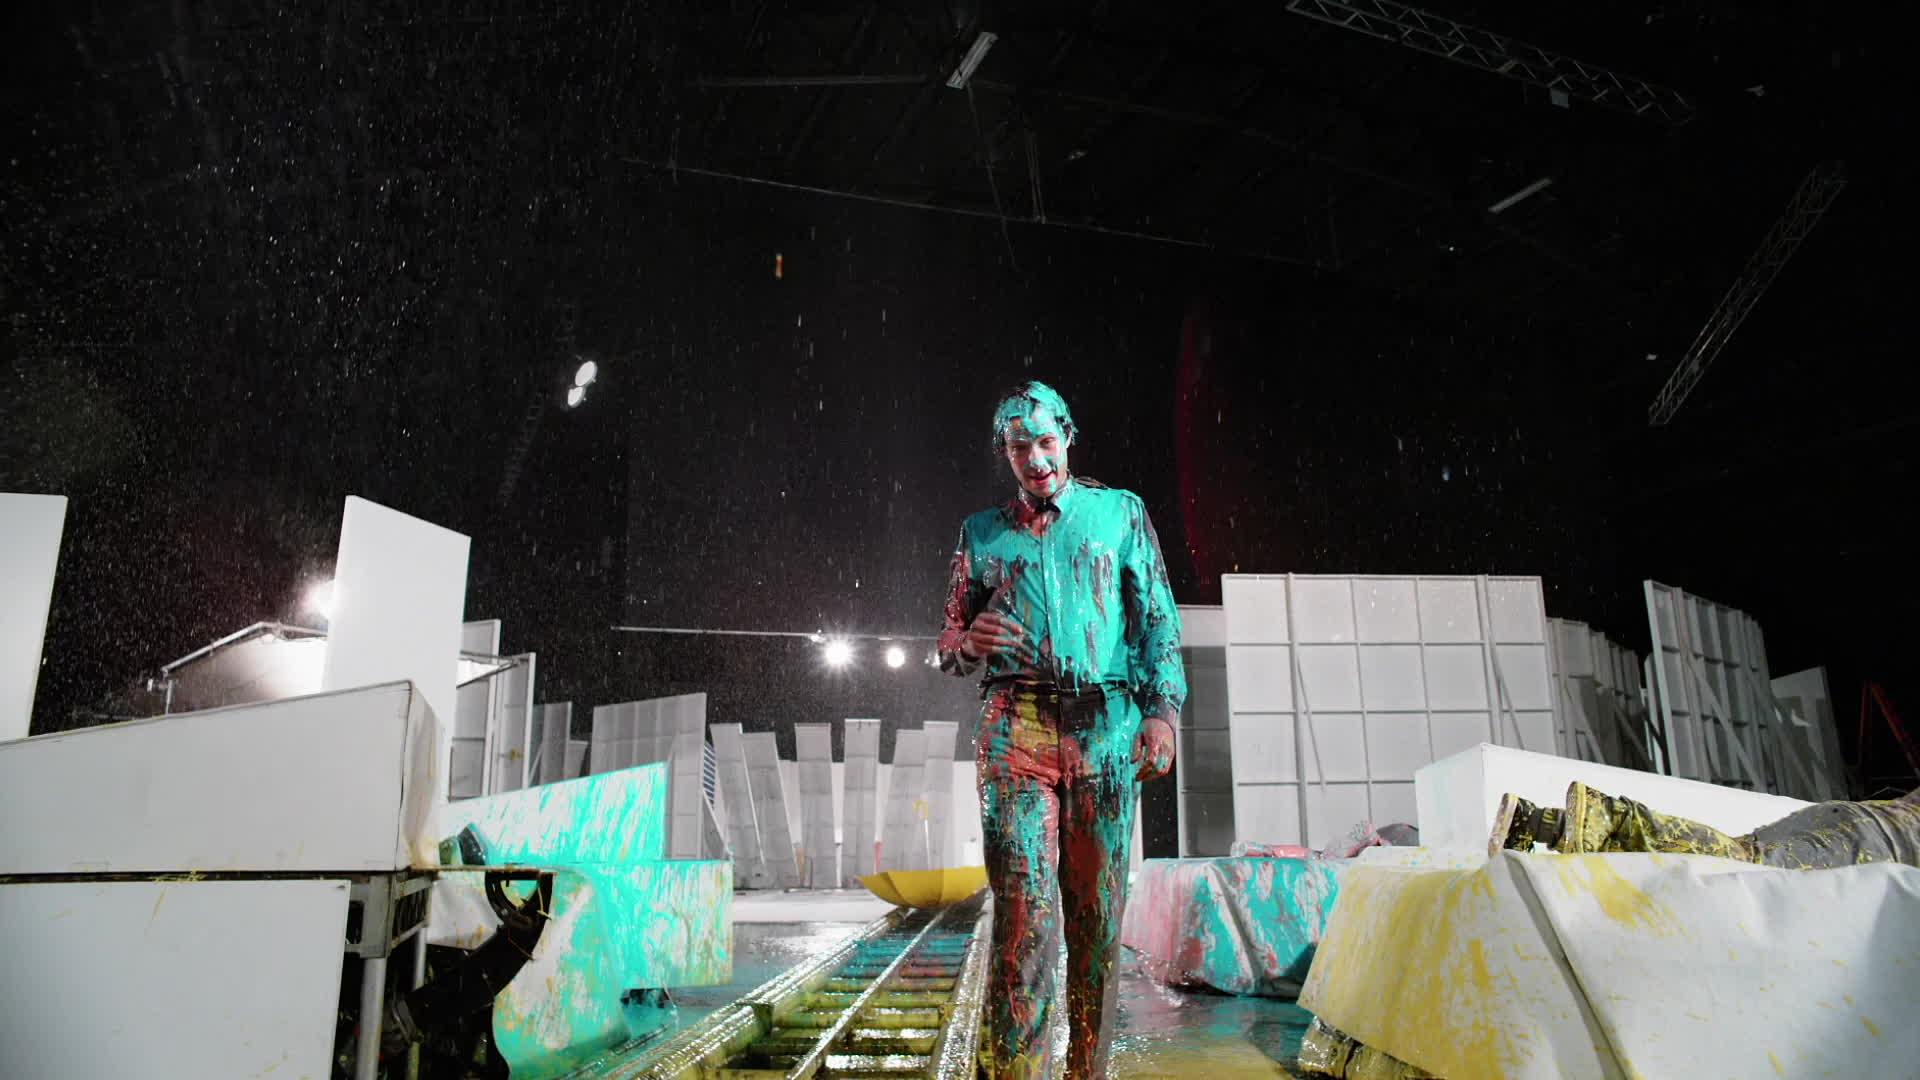 OK Go, The One Moment, moment, morton, music, okgo, one, theonemoment, Moment in Reverse - OK Go GIFs